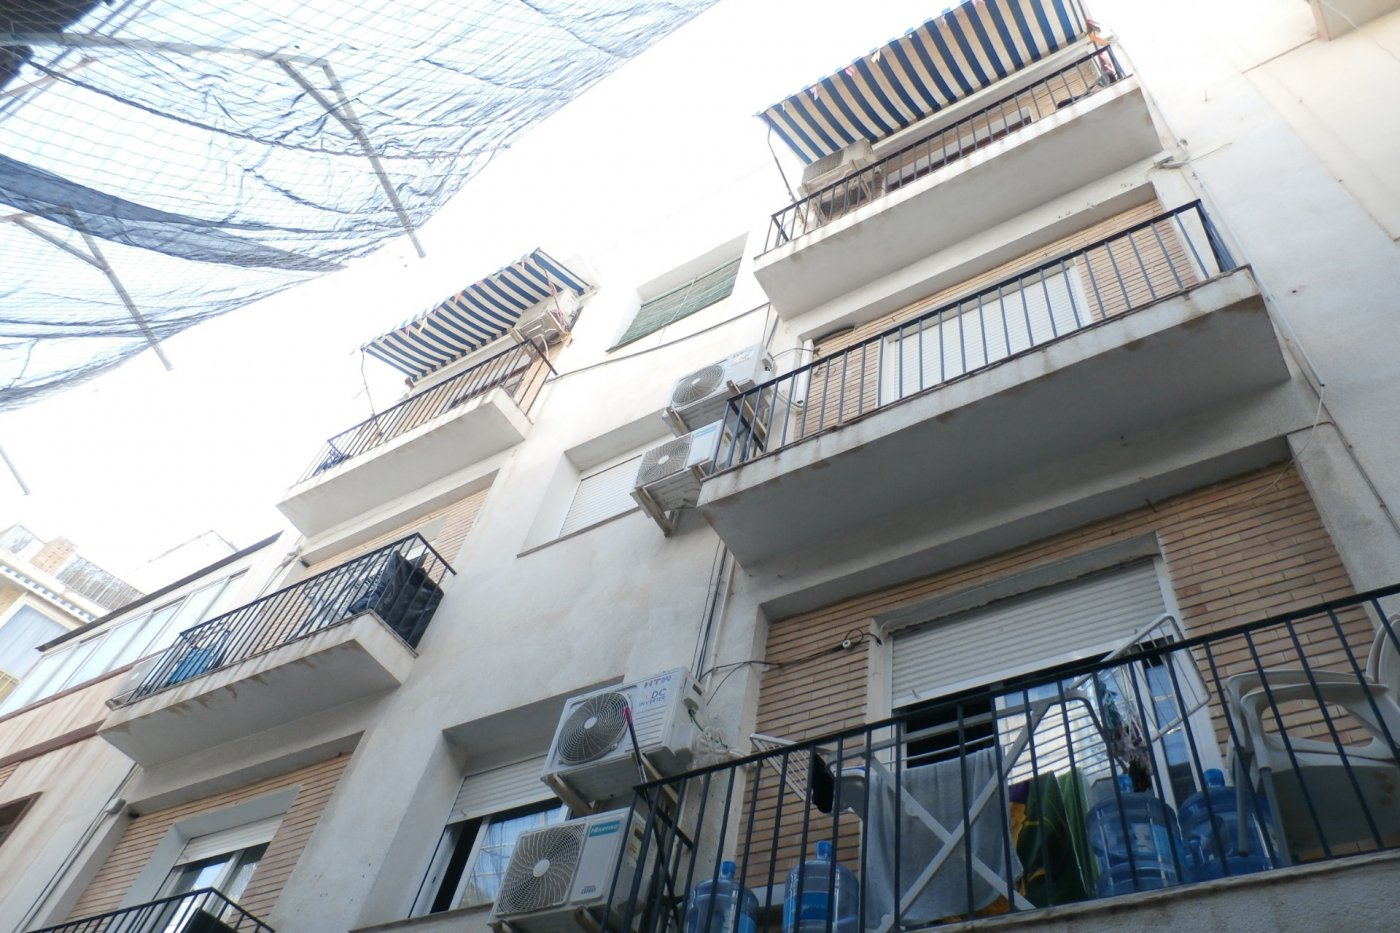 Edifici  Benidorm ,centro. ¡¡¡inversión!!! edificio en pleno centro con 2 locales comercial